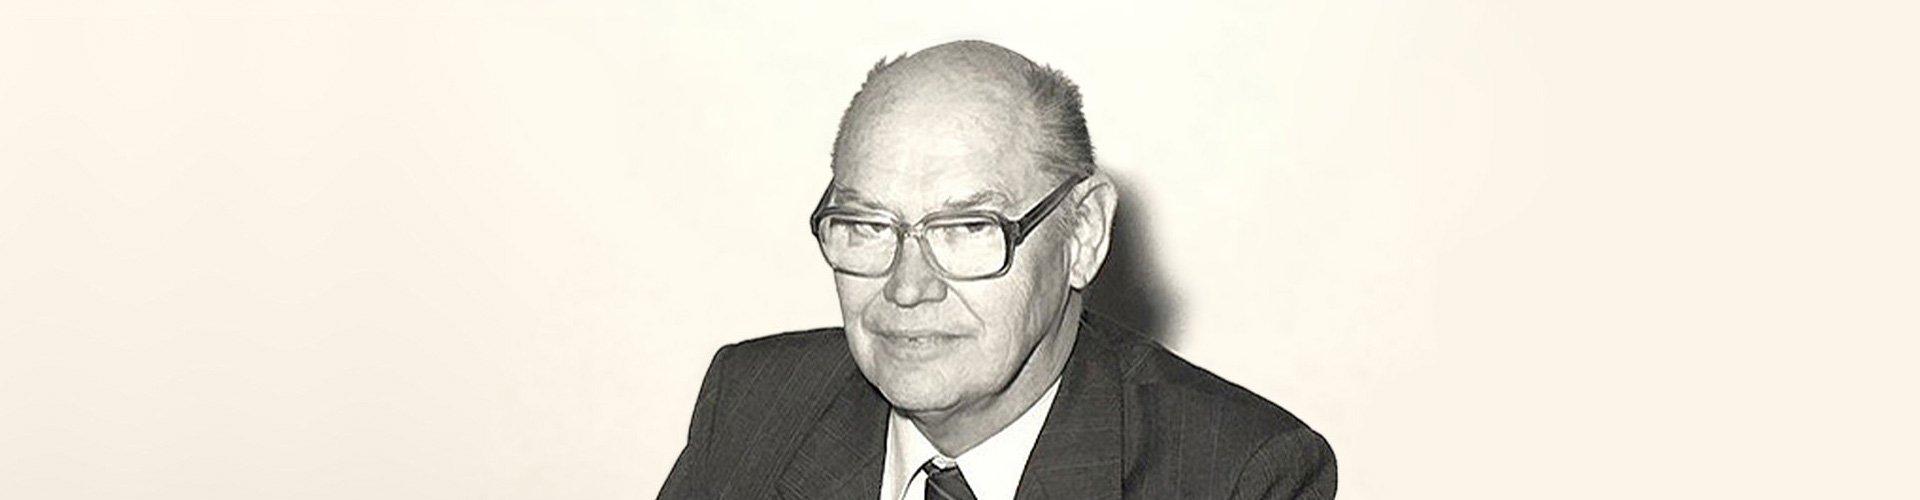 Rufus Grason Founder